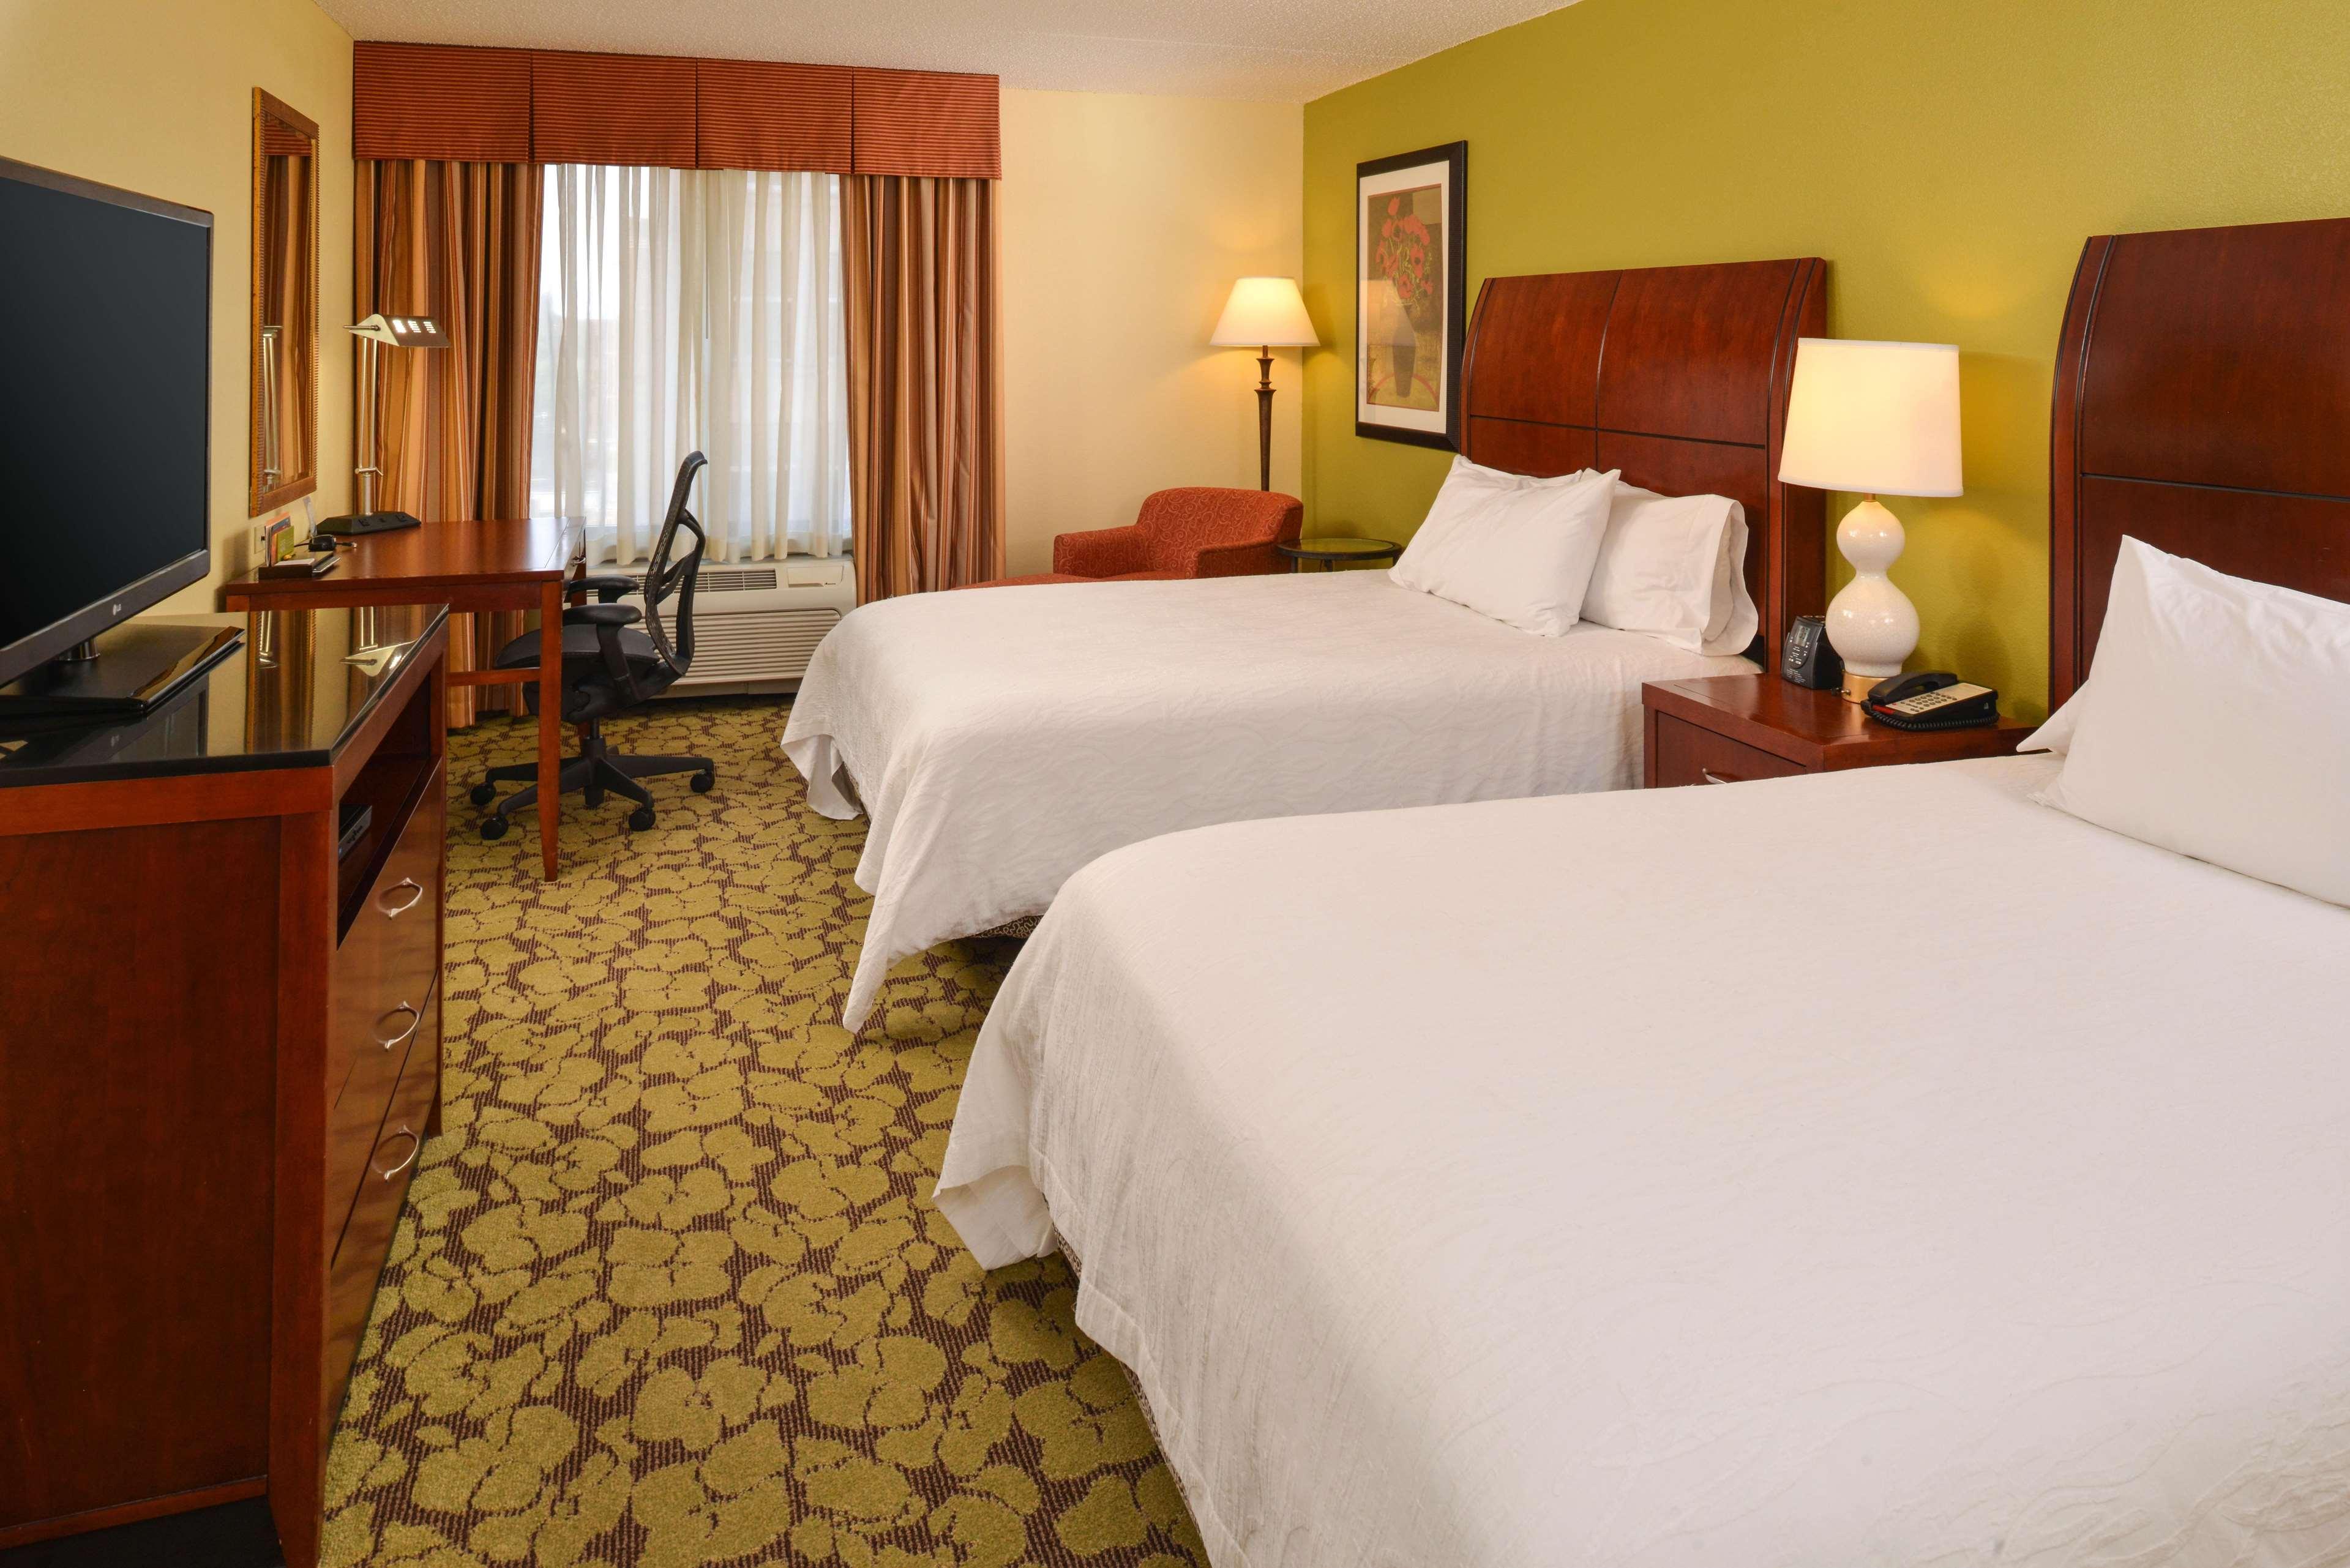 Hilton Garden Inn Terre Haute image 29